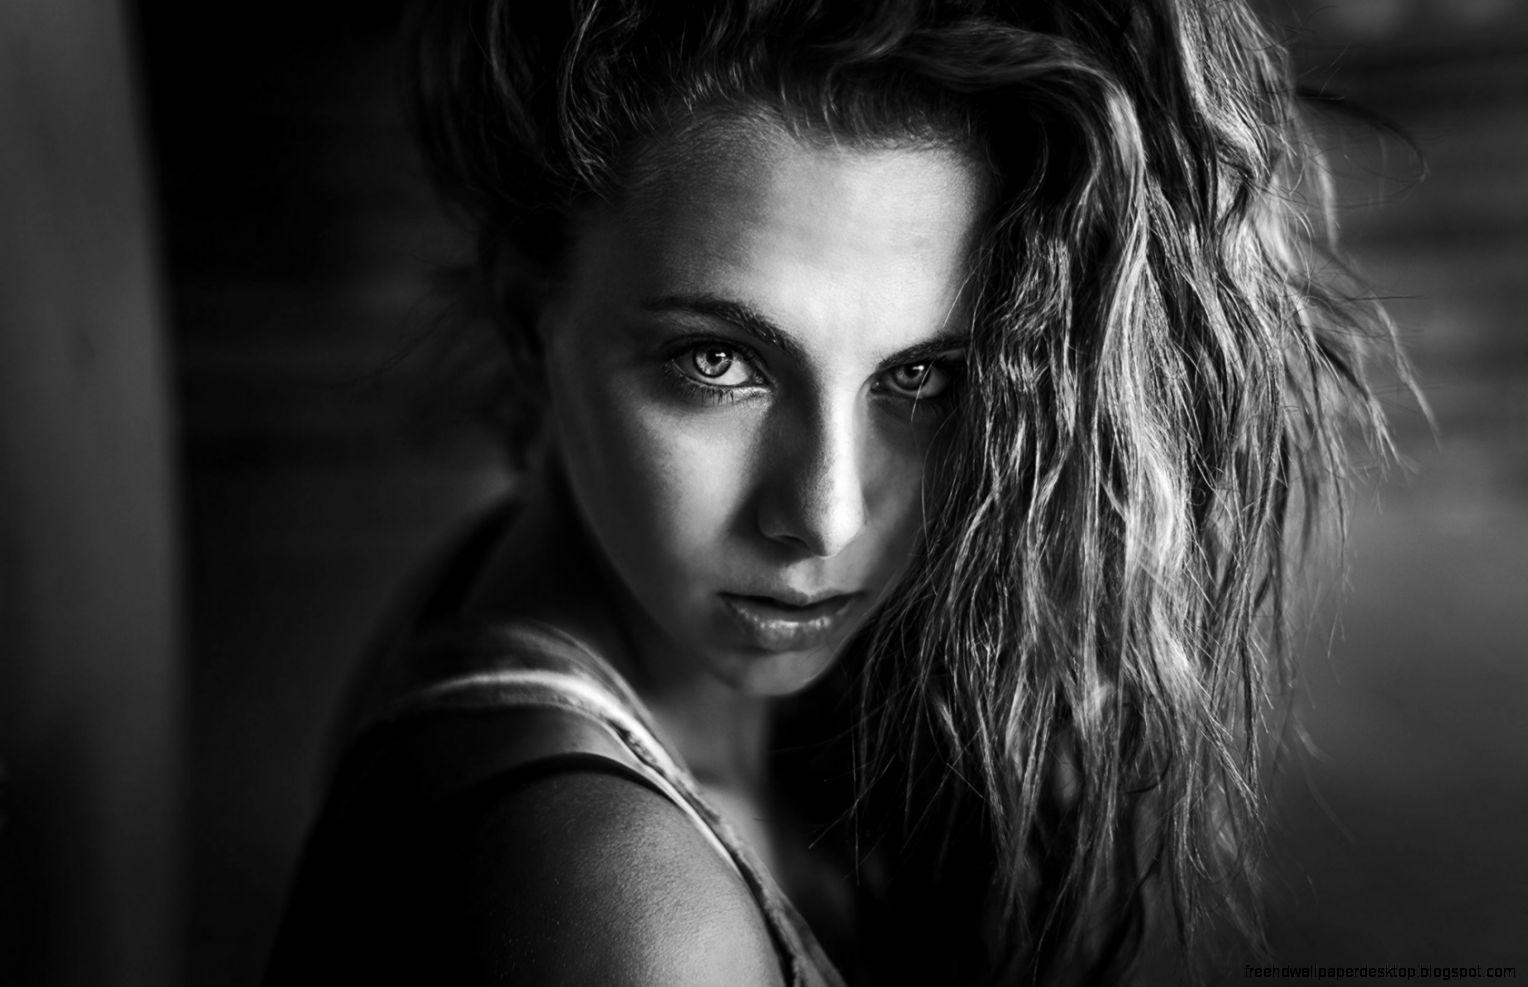 Beautiful girl portrait black white hd wallpaper free high